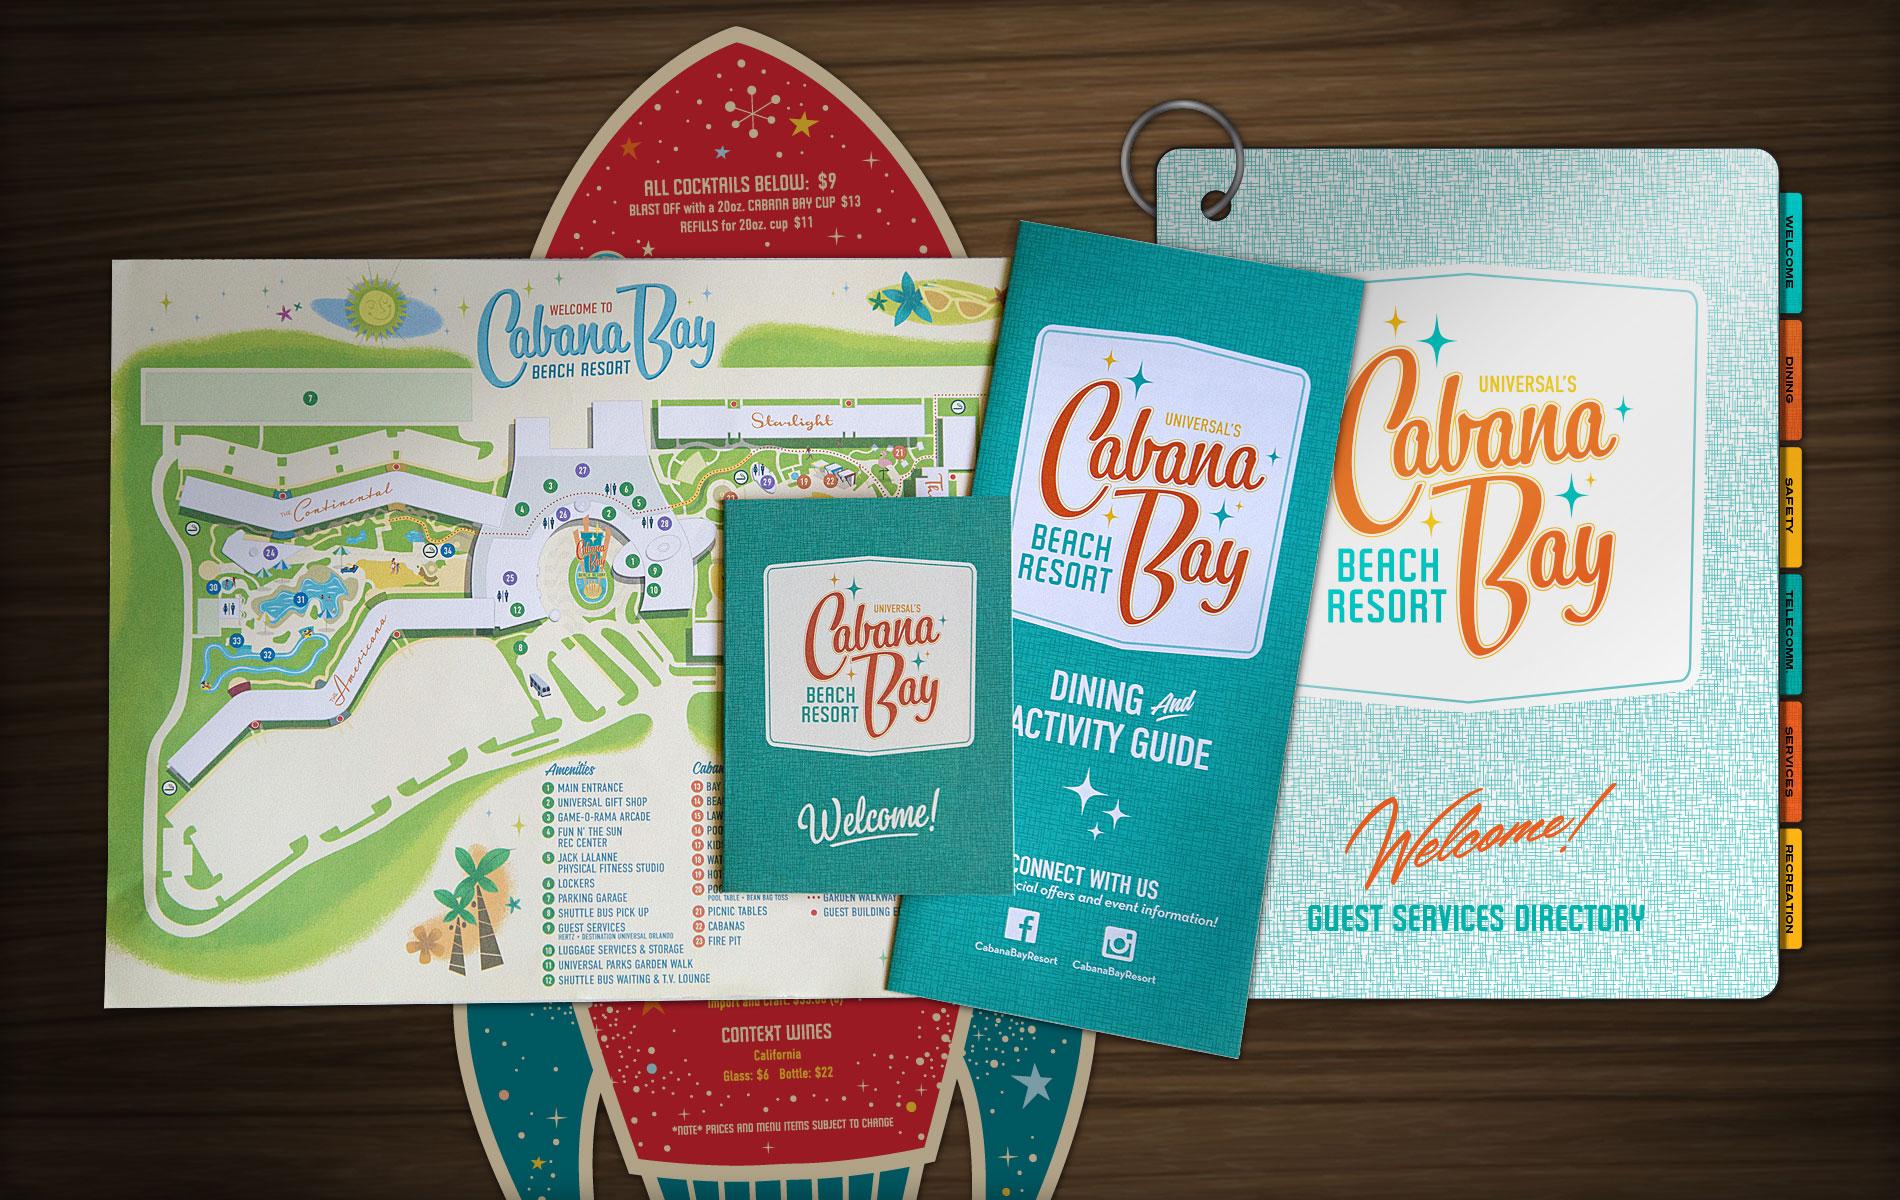 Cabana Bay Hotel Map